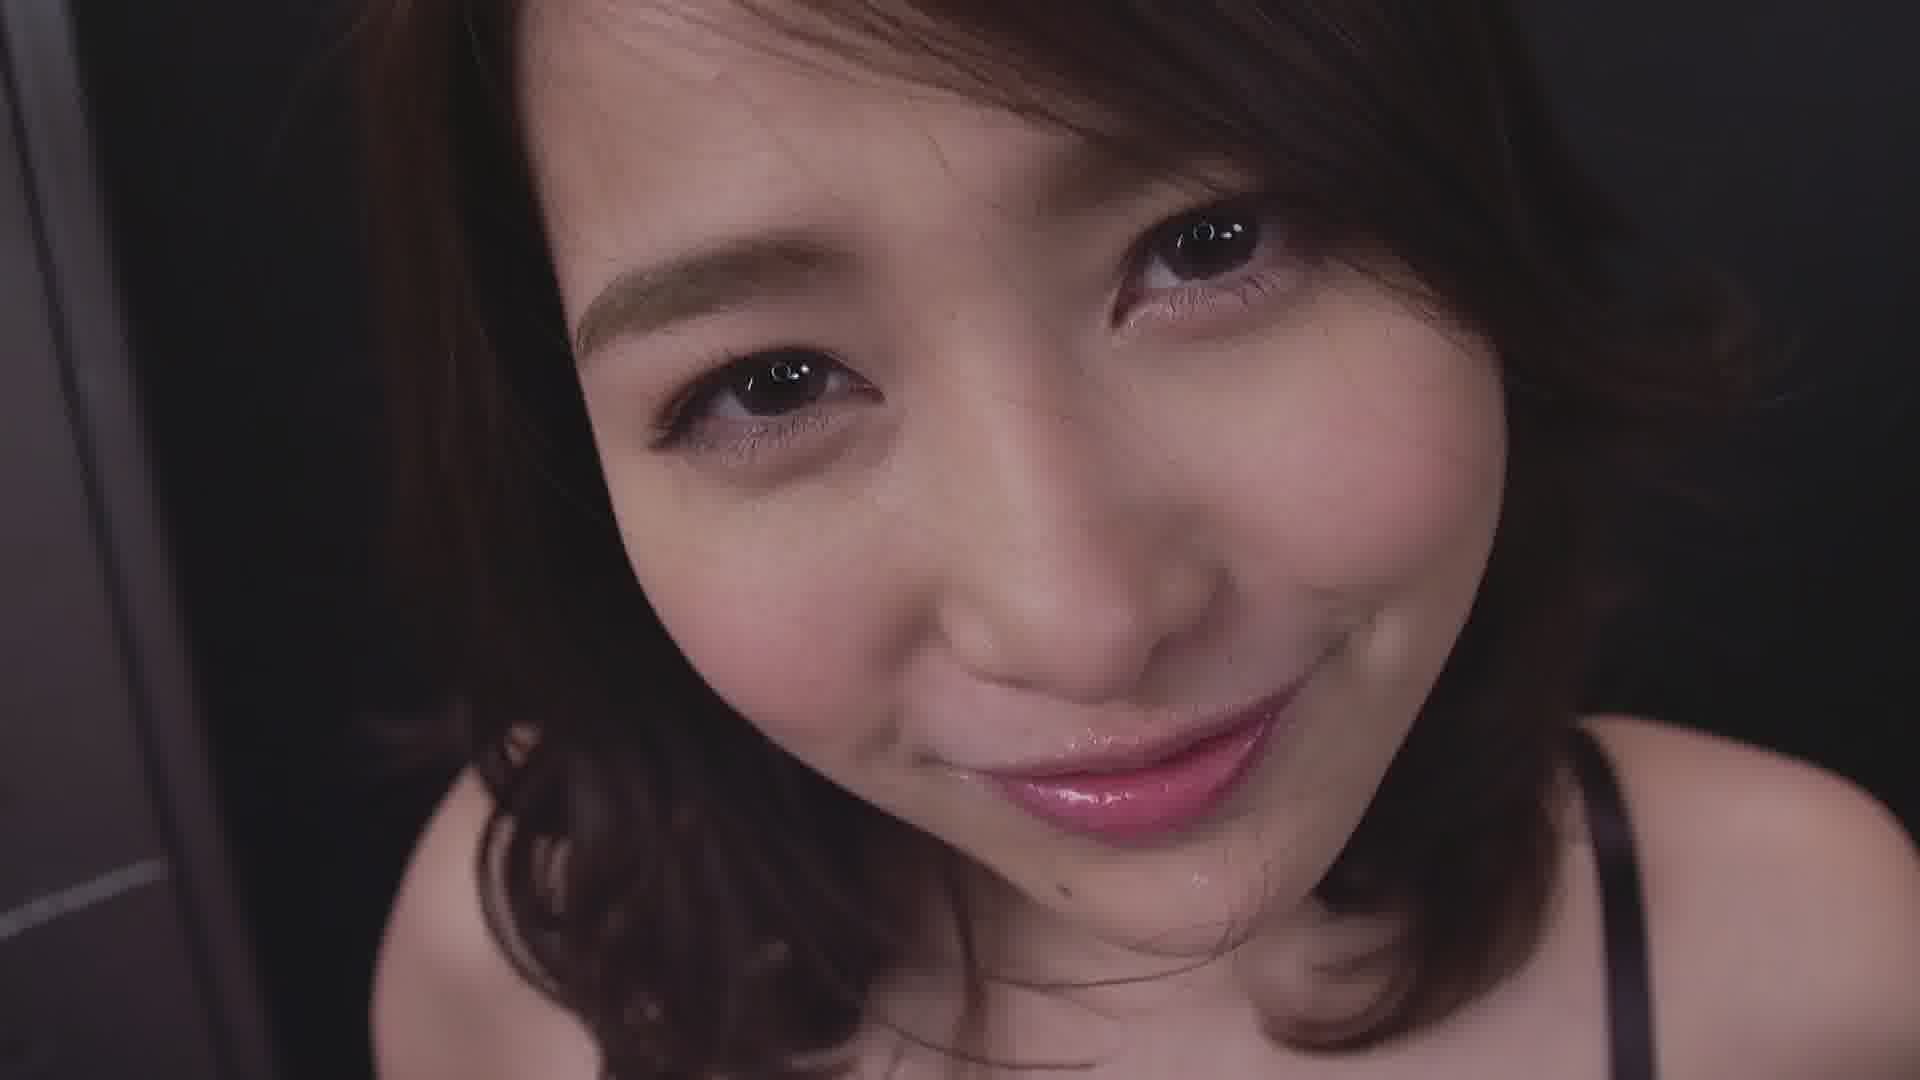 THE 未公開 ~喉オナホ6~ - 小野寺梨紗【痴女・イラマチオ・ごっくん】